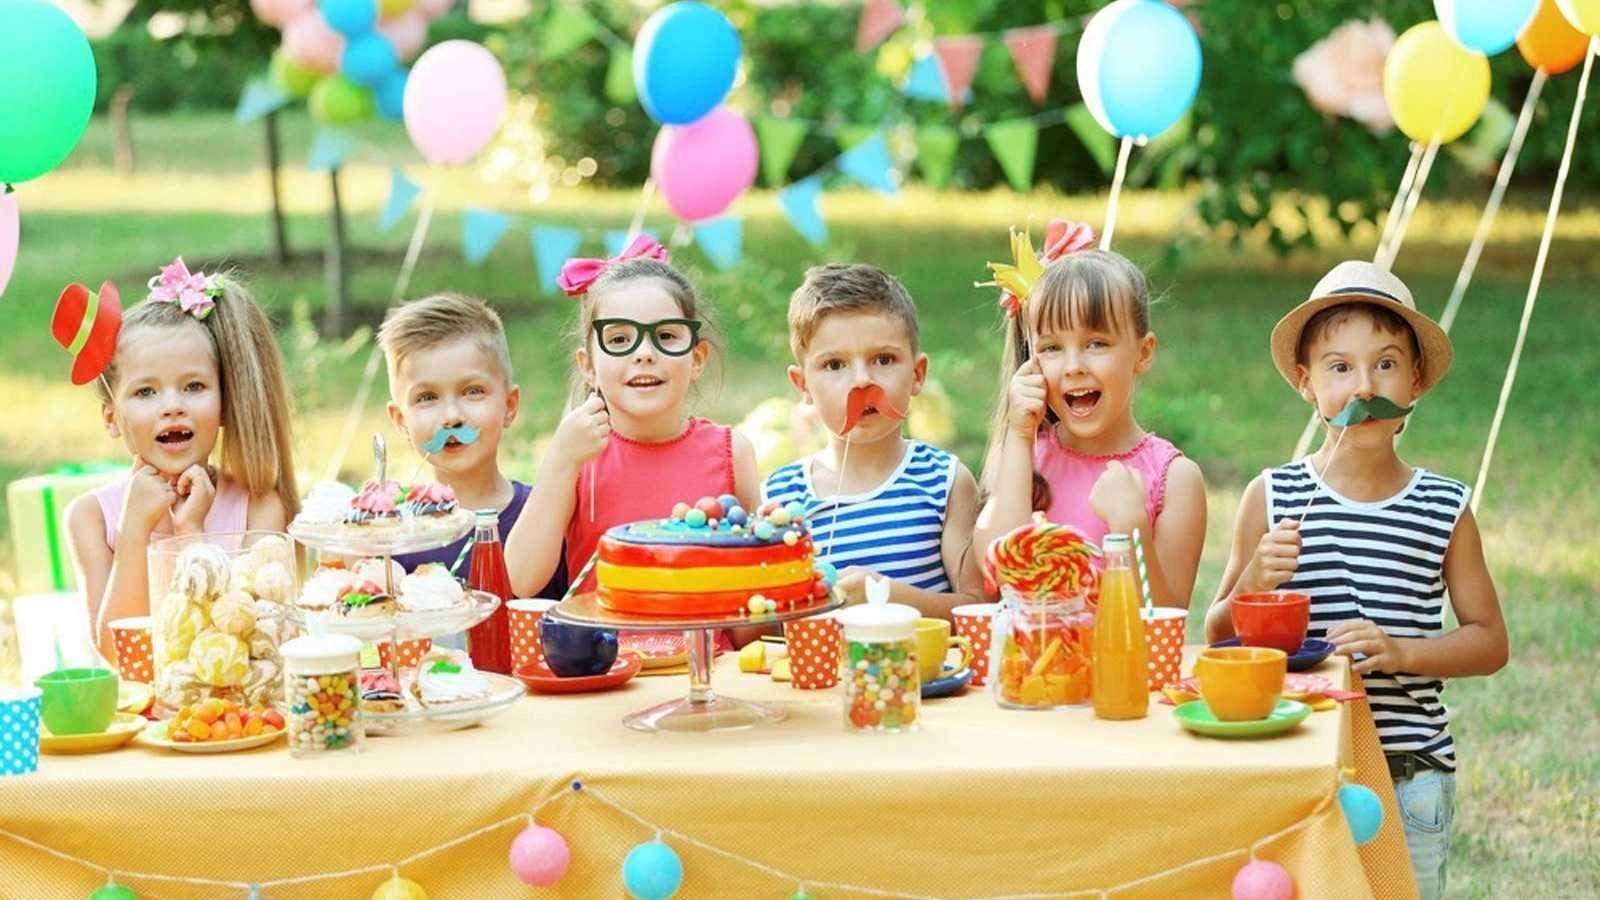 Фотоотчет о праздновании годика на природе